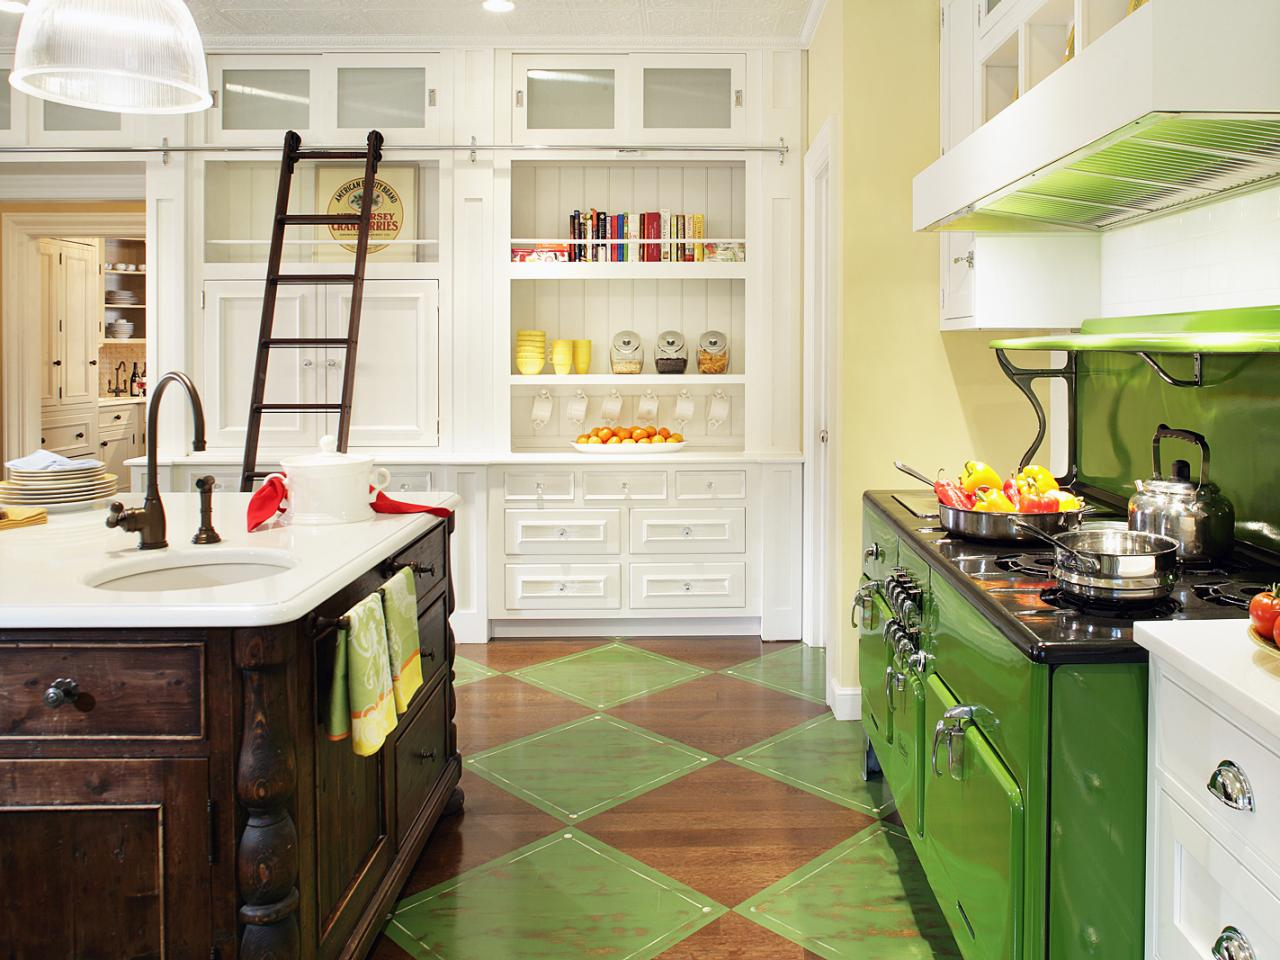 RS_Regina-Bilotta-Yellow-Green-Kitchen-2_s4x3.jpg.rend.hgtvcom.1280.960